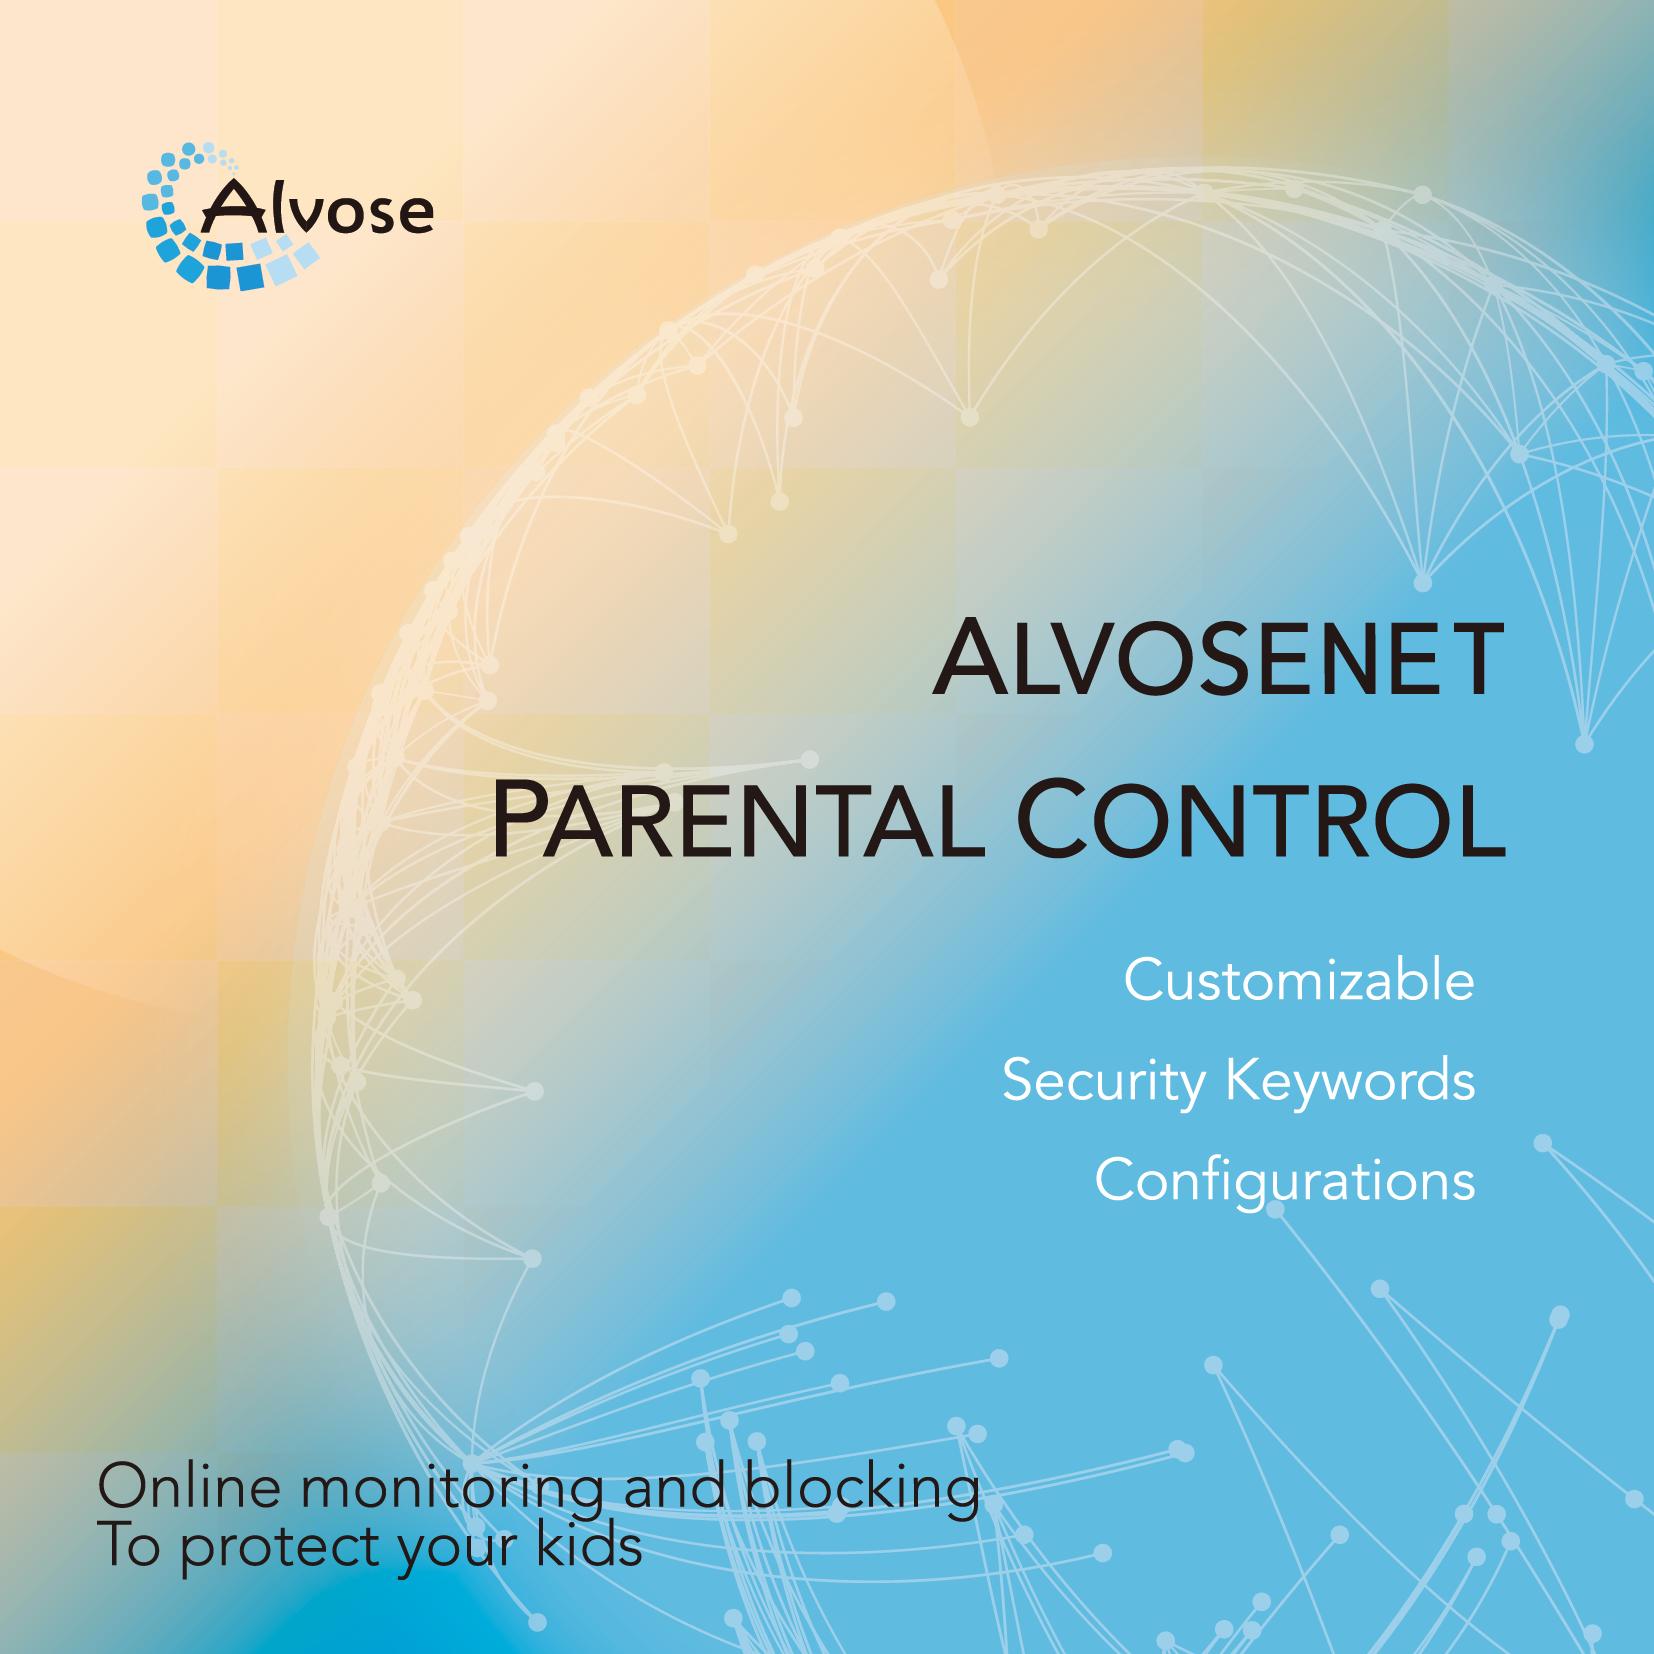 alvosenet-software-for-parental-control-download